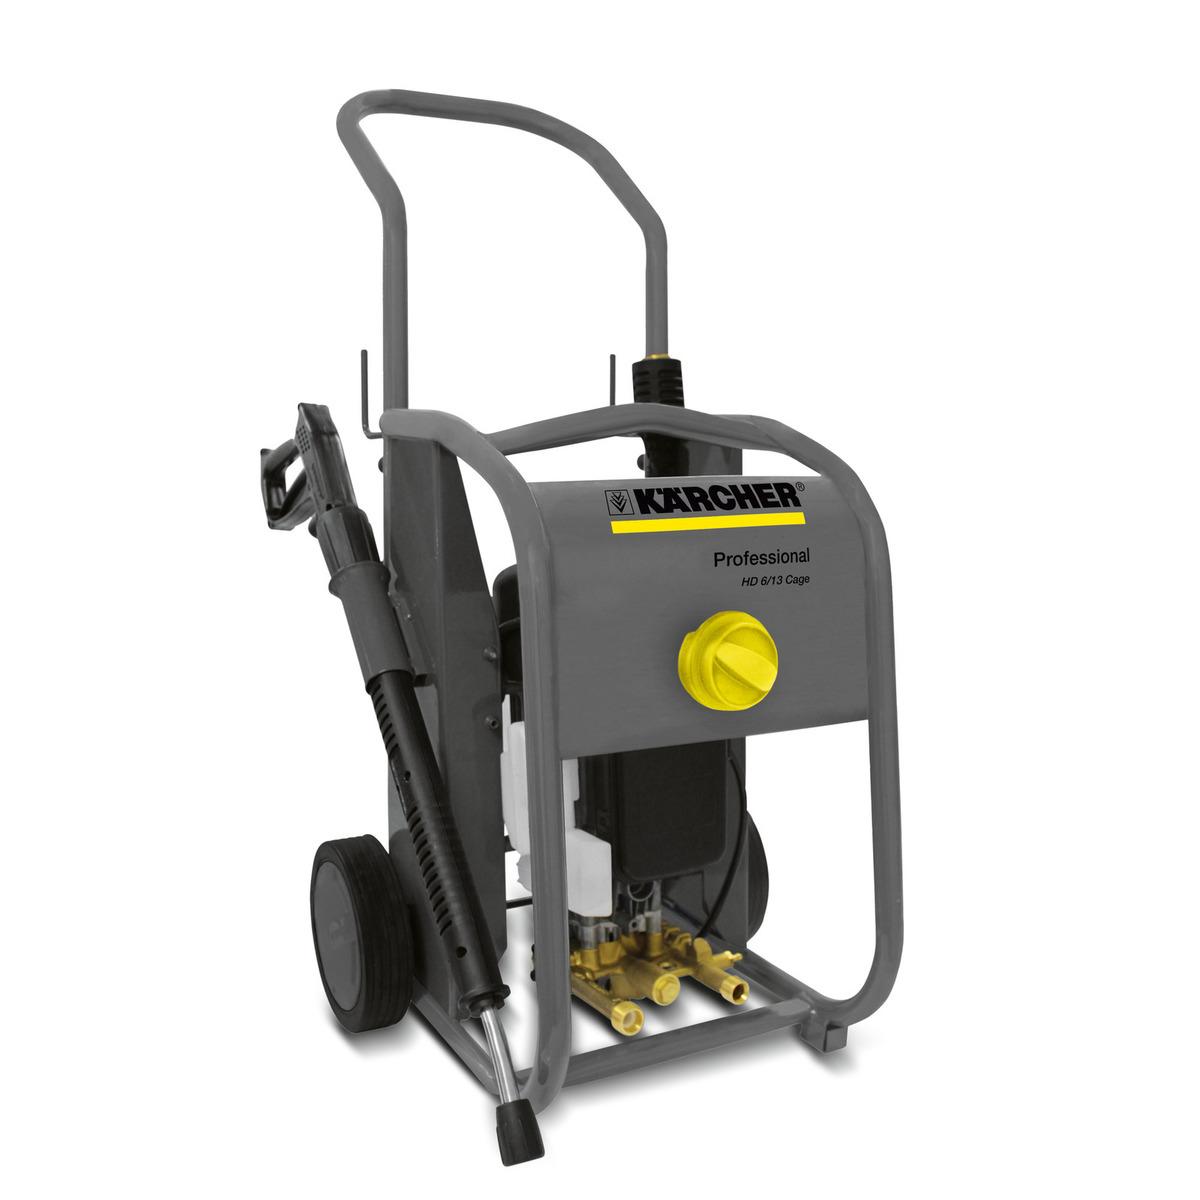 Lavadora de Alta Pressão Karcher - HD 6/15 CAGE PLUS  - 2175 psi 220V 3300W